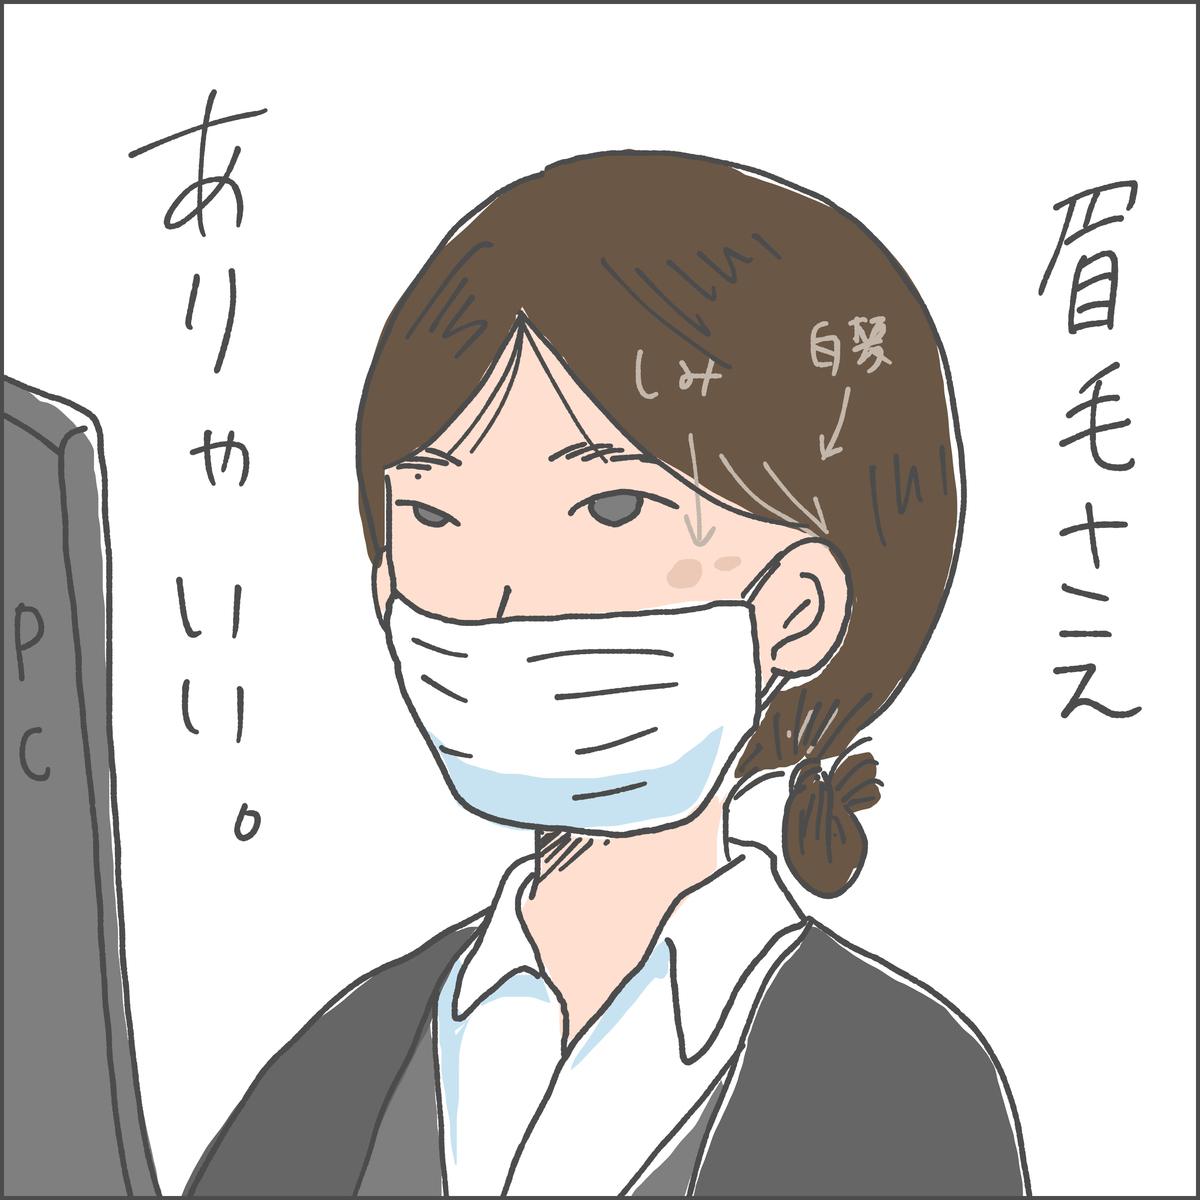 f:id:ika_yoshi:20210417235856j:plain